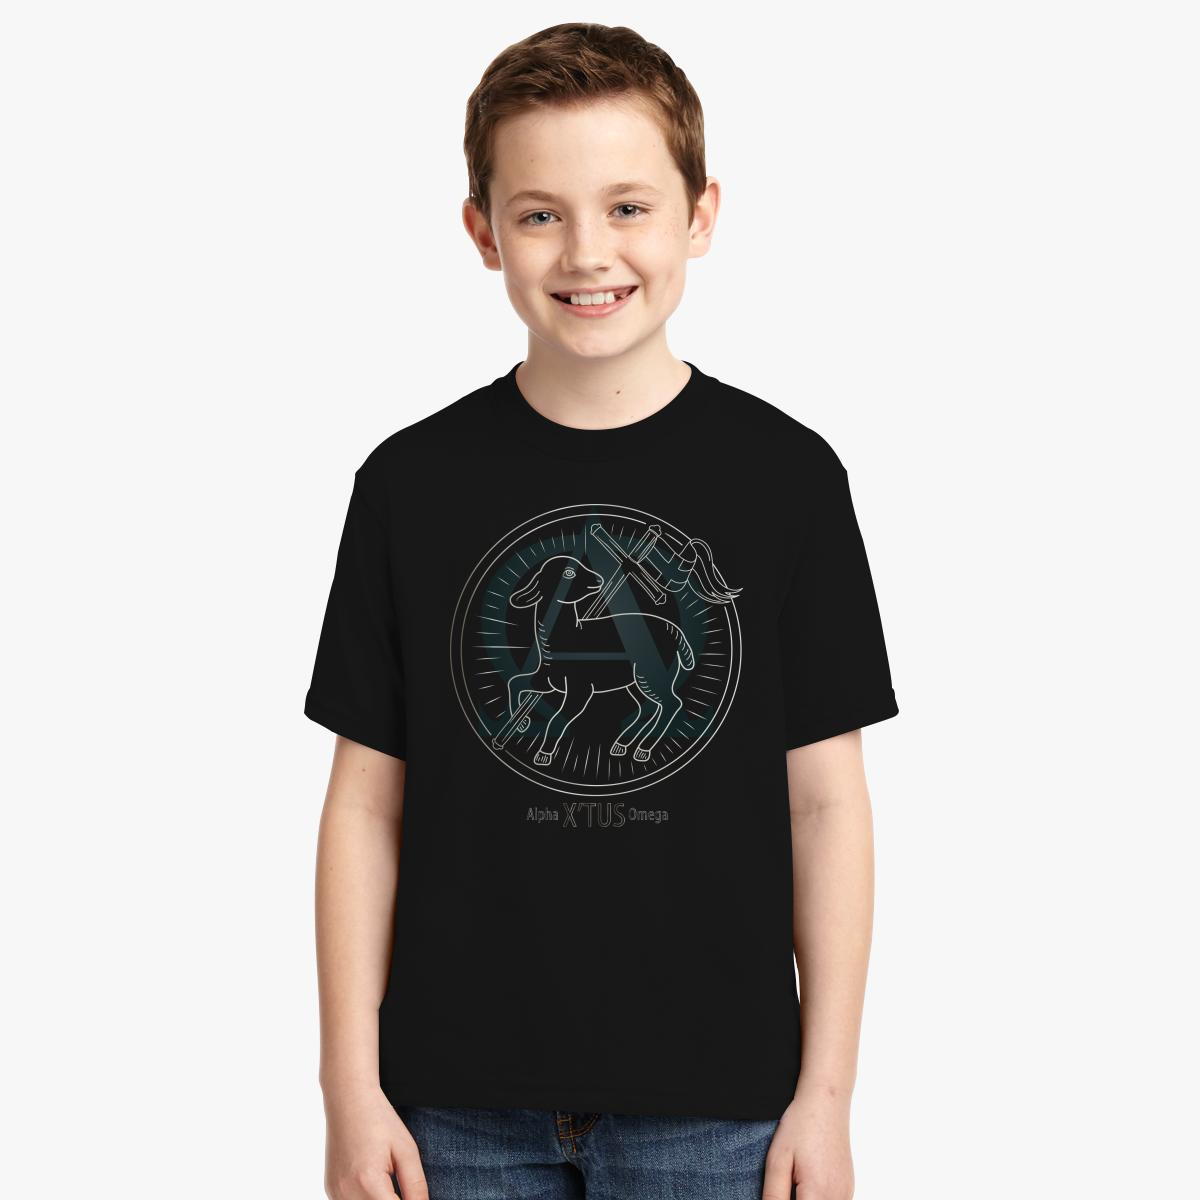 Buy Alpha Omega Youth T-shirt, 442841